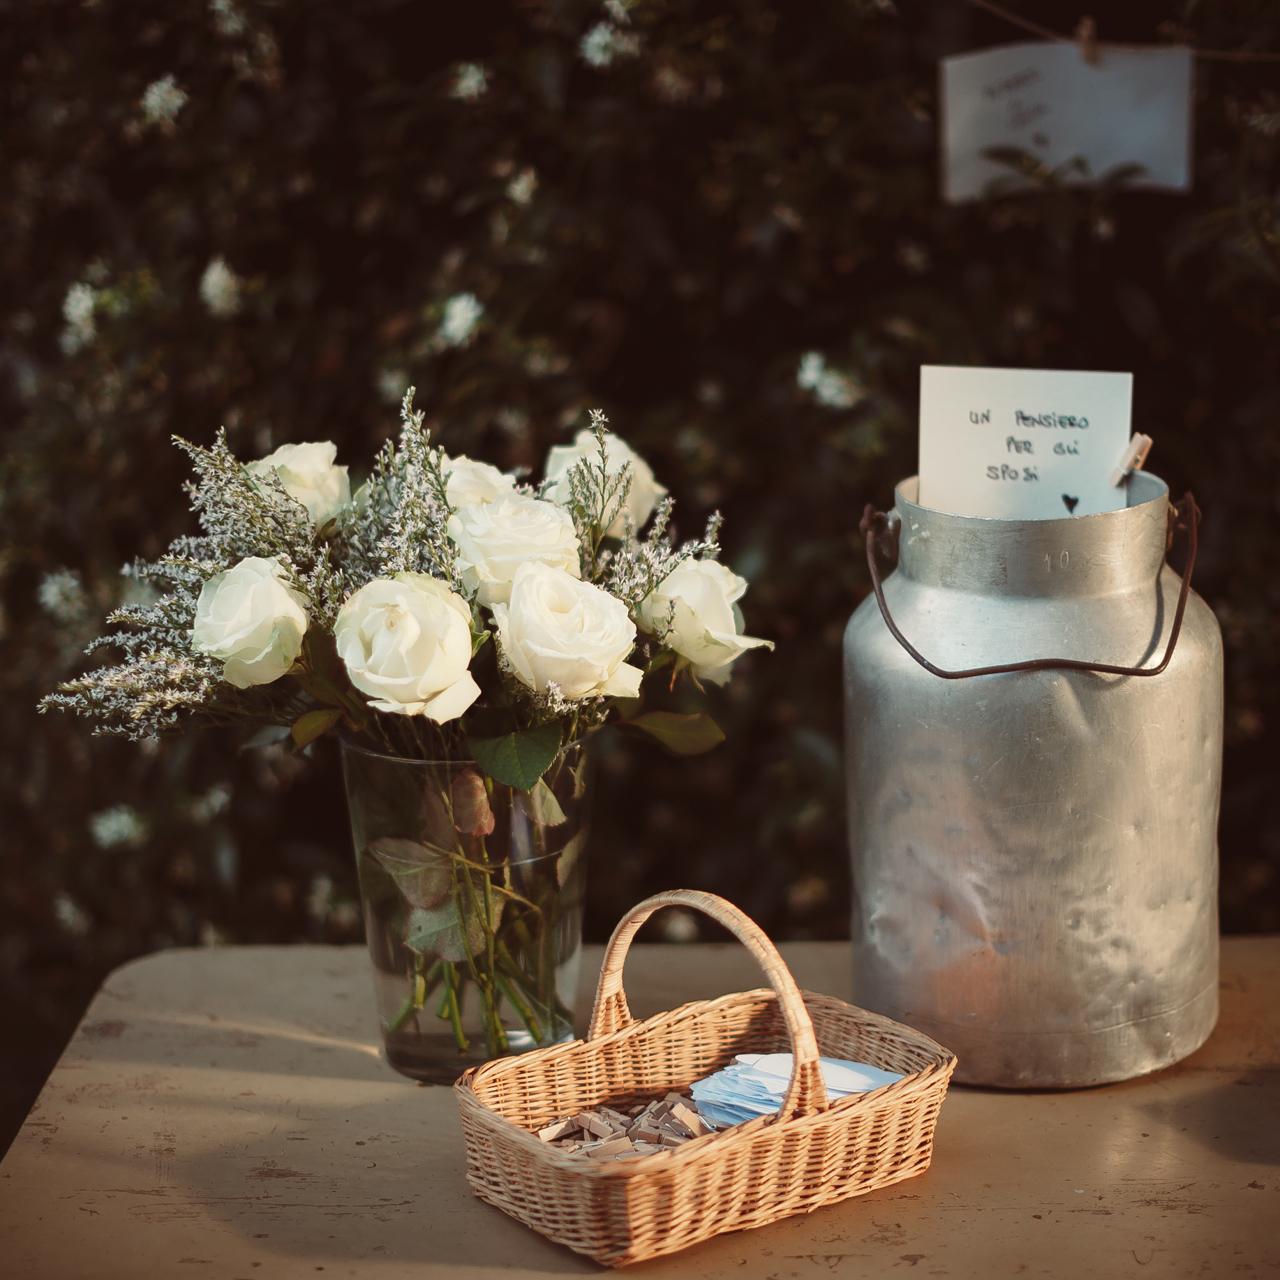 Rose e pensieri per gli sposi